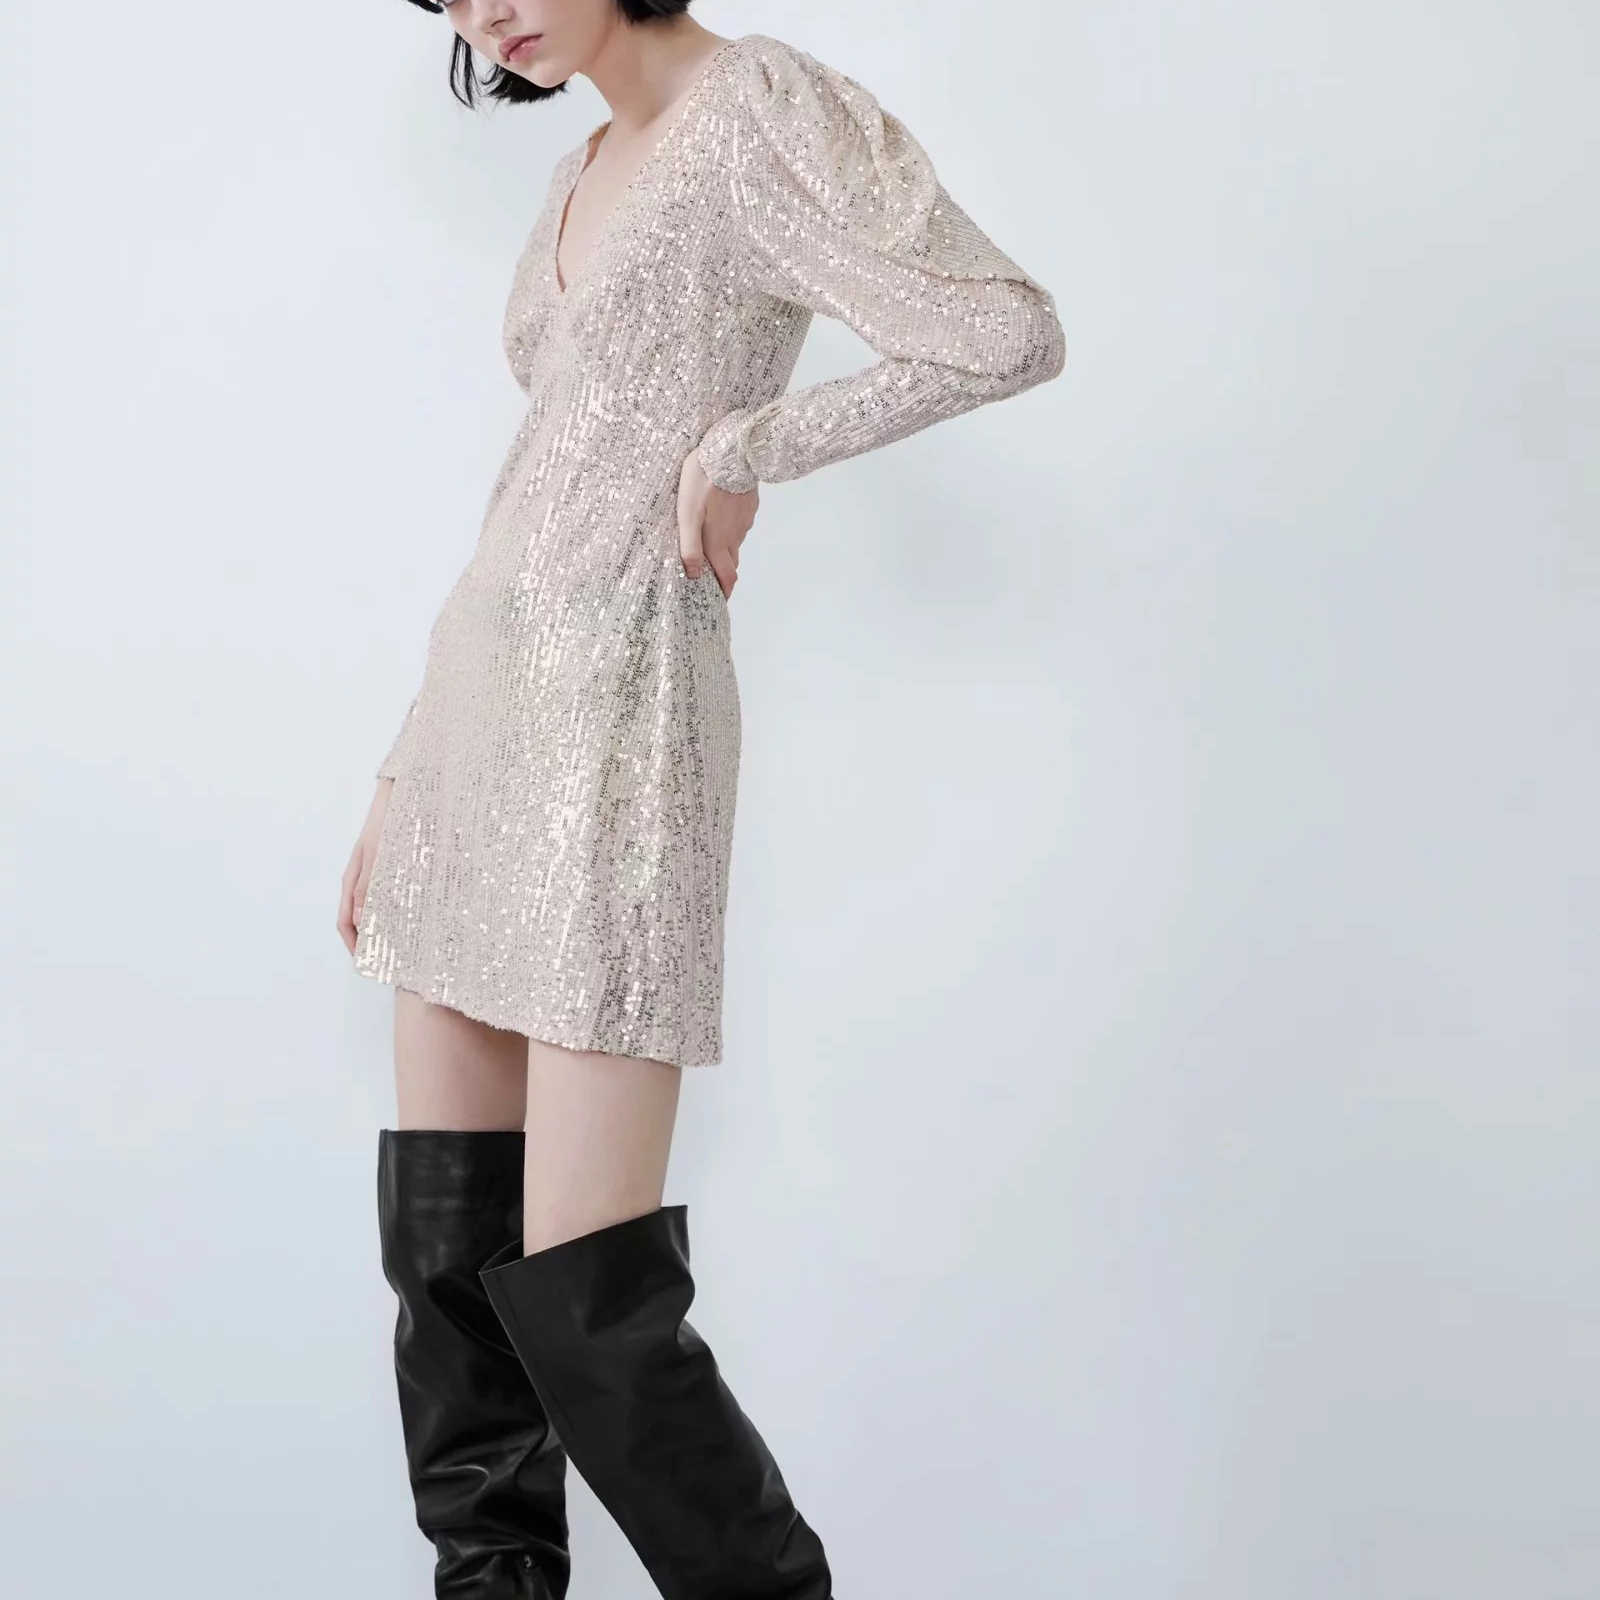 ZA נשים של שמלת נצנצים סקסי אלסטי עמוק v צוואר פאף שרוול מקרית אופנה למתוח מצויד מבריק מסיבת שמלת נקבה